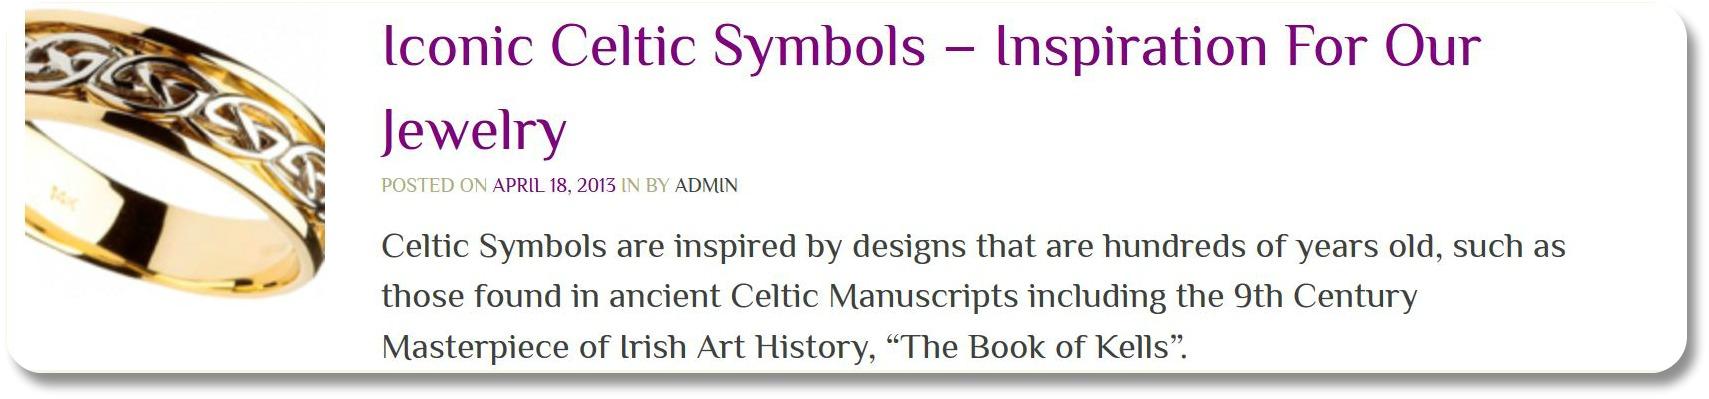 Celtic Symbols - Shanora Irish Handcrafted Jewelry